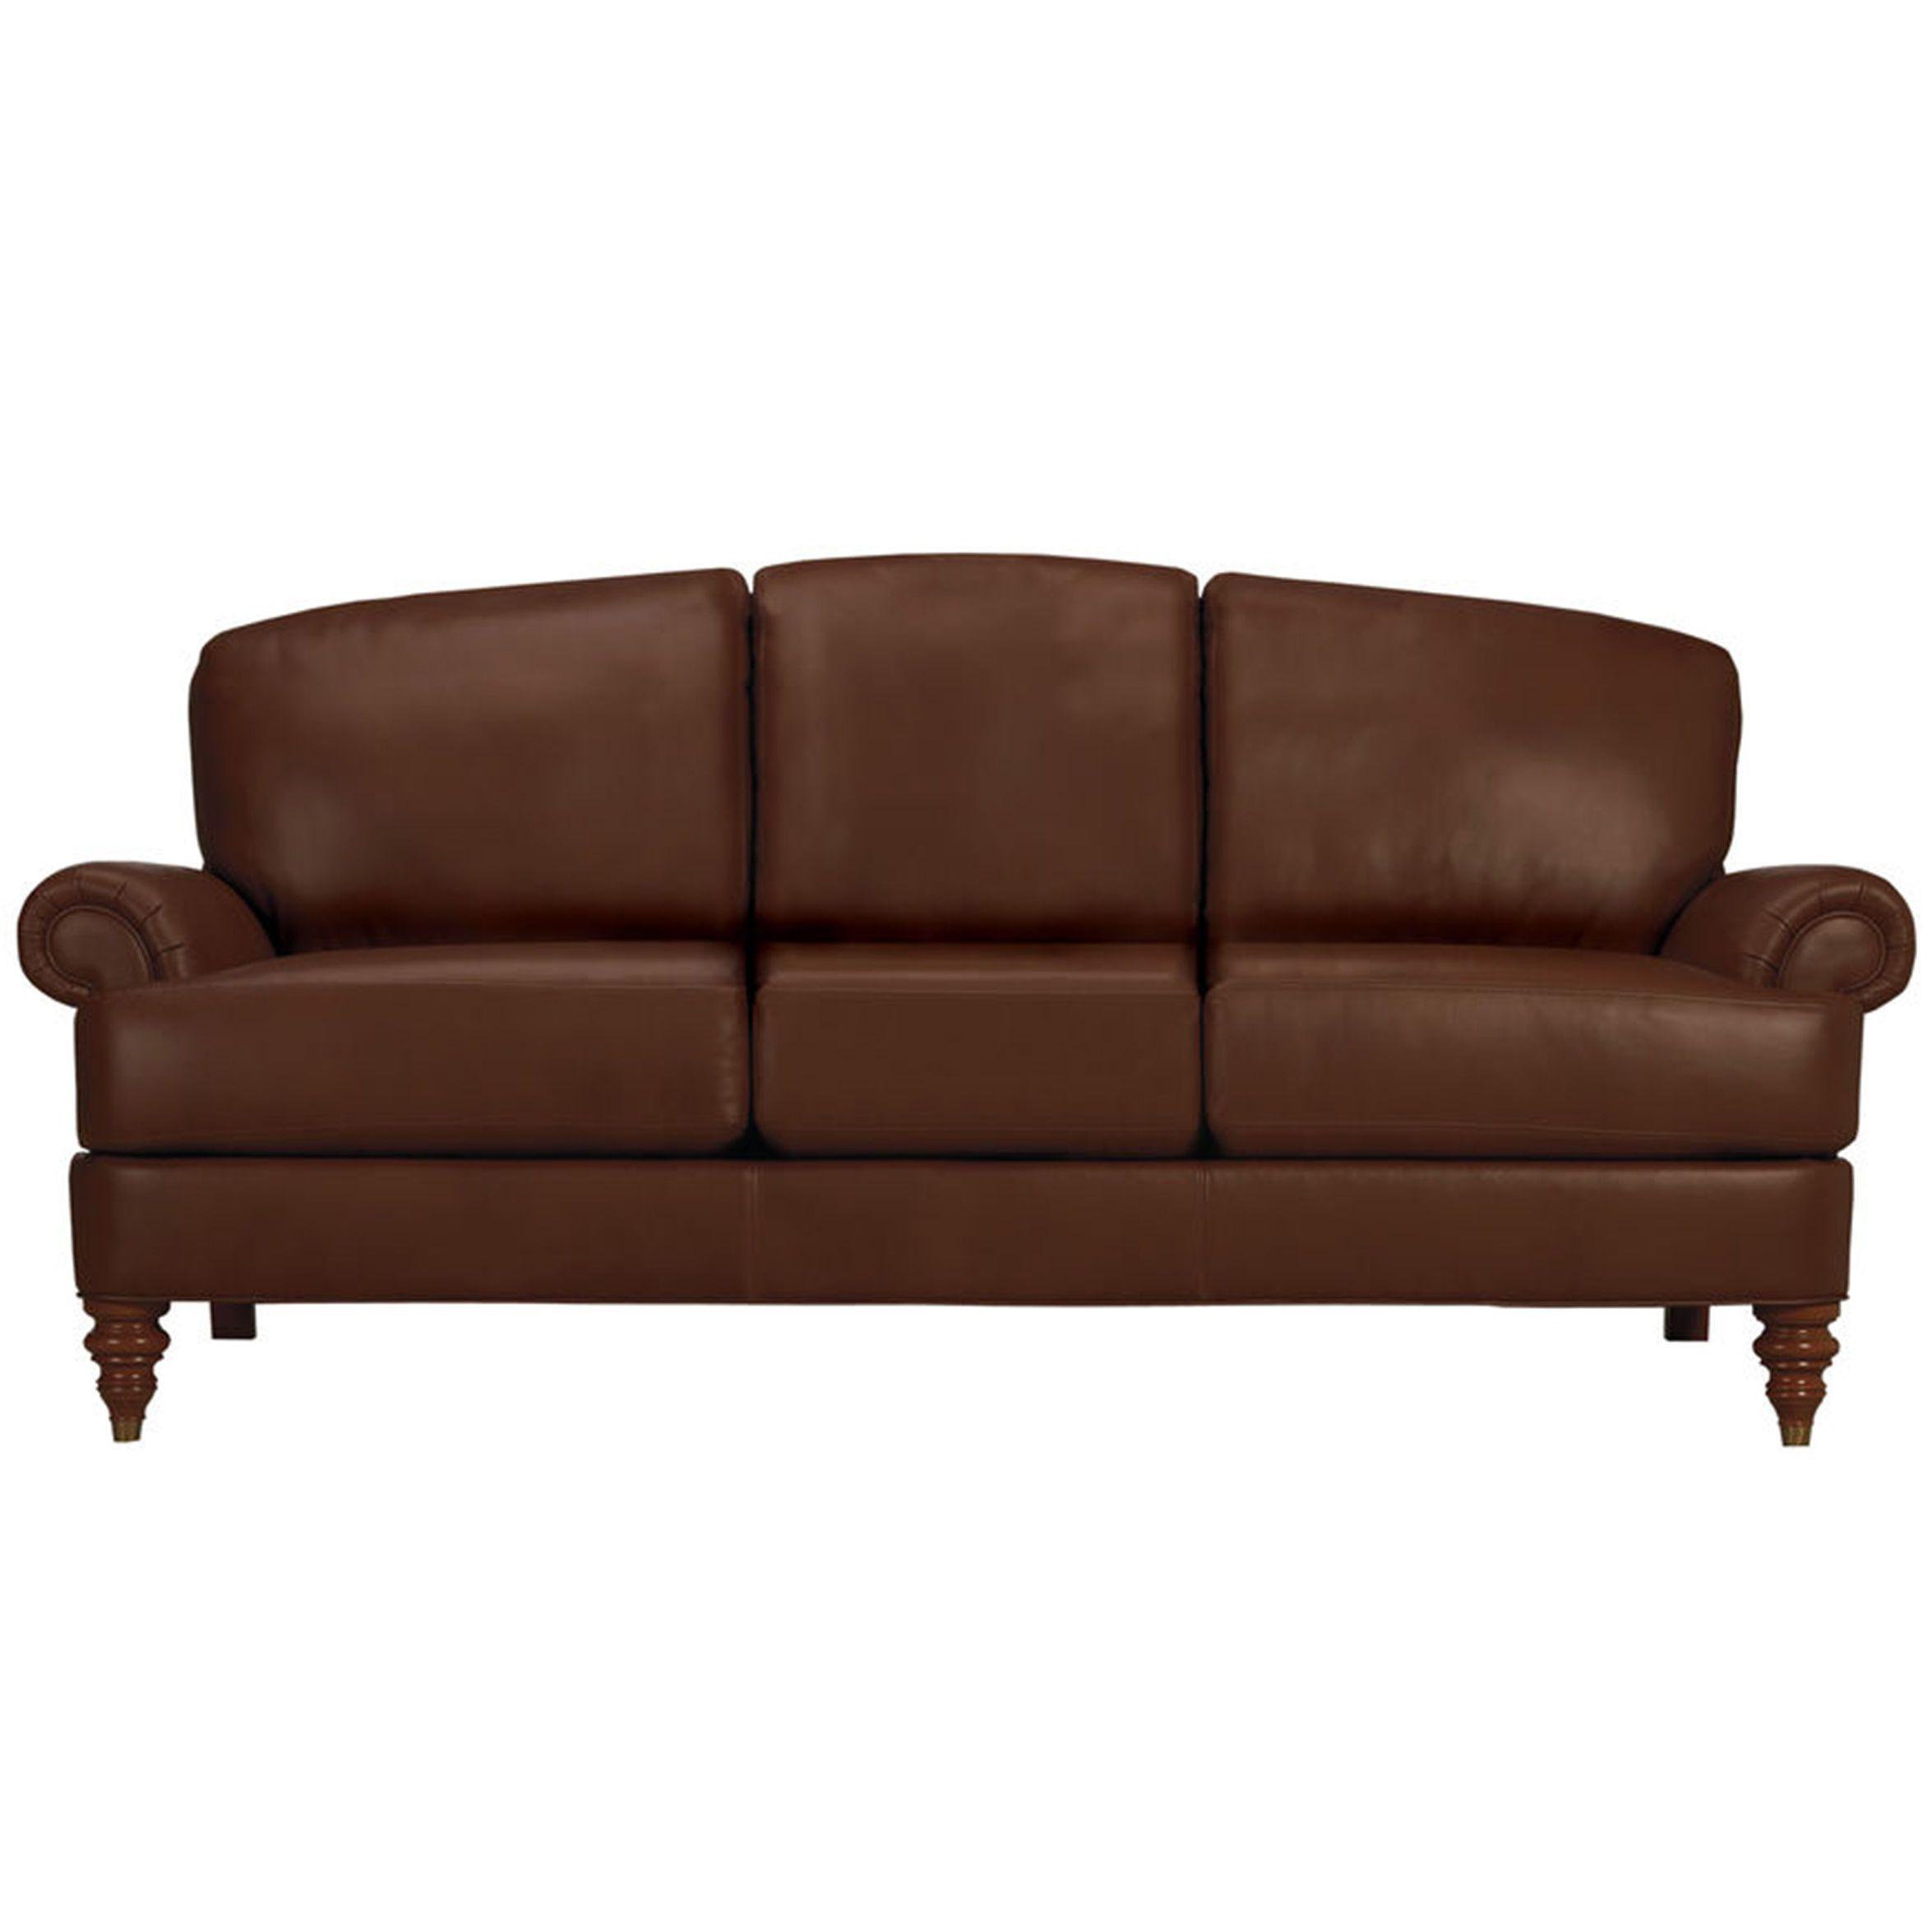 Superior Hyde Three Cushion Leather Sofa   Ethan Allen US